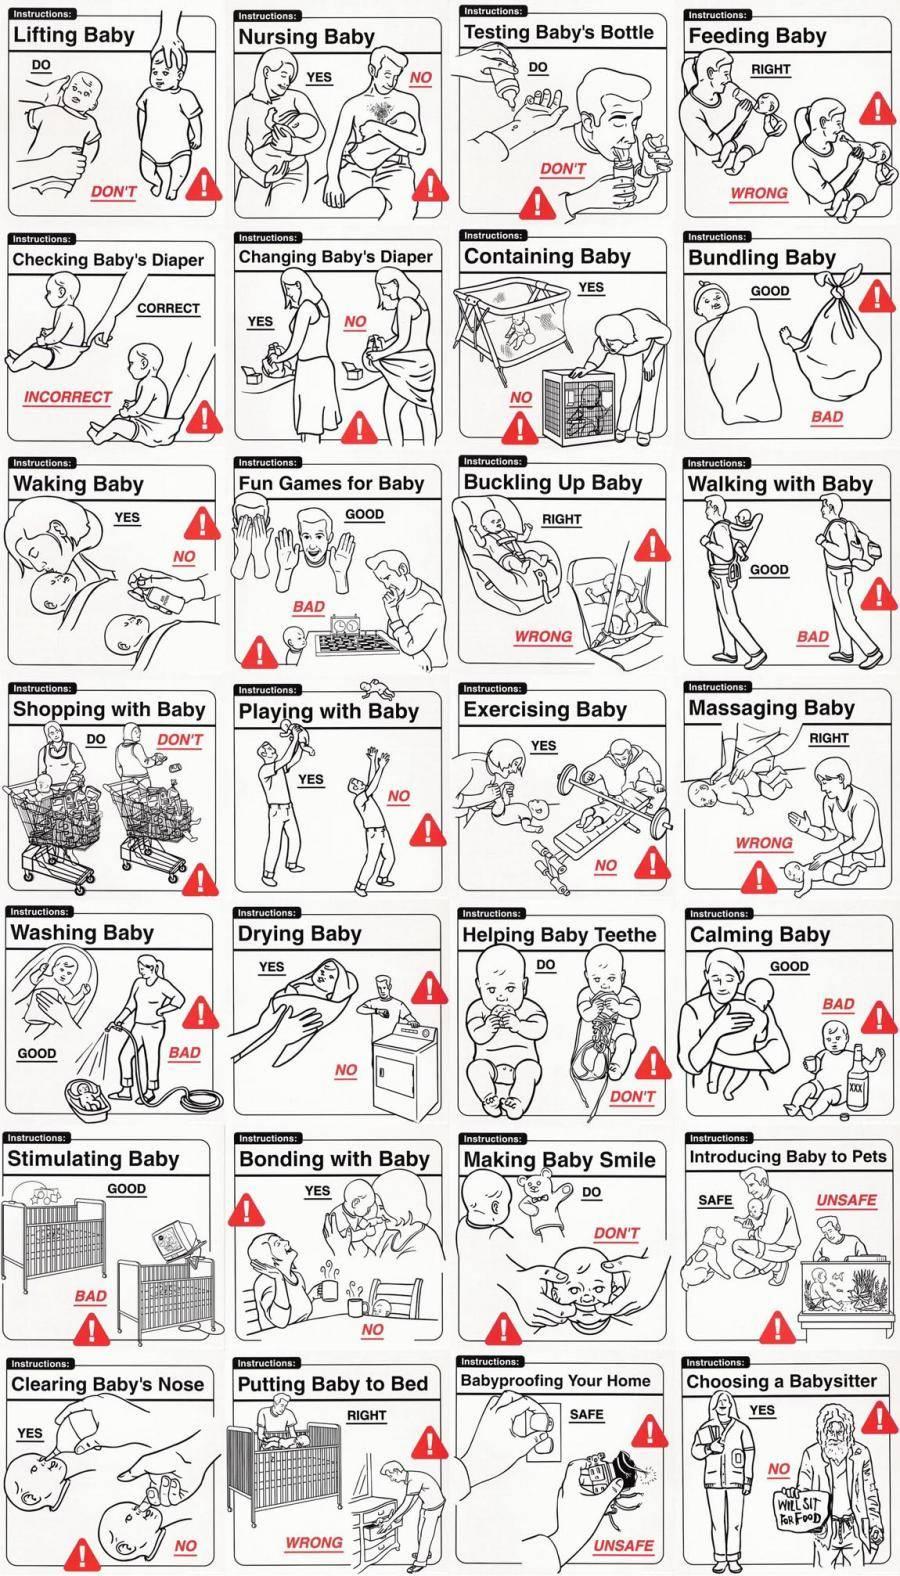 Safe Baby Handling Tips eBook e-book download - 2shared